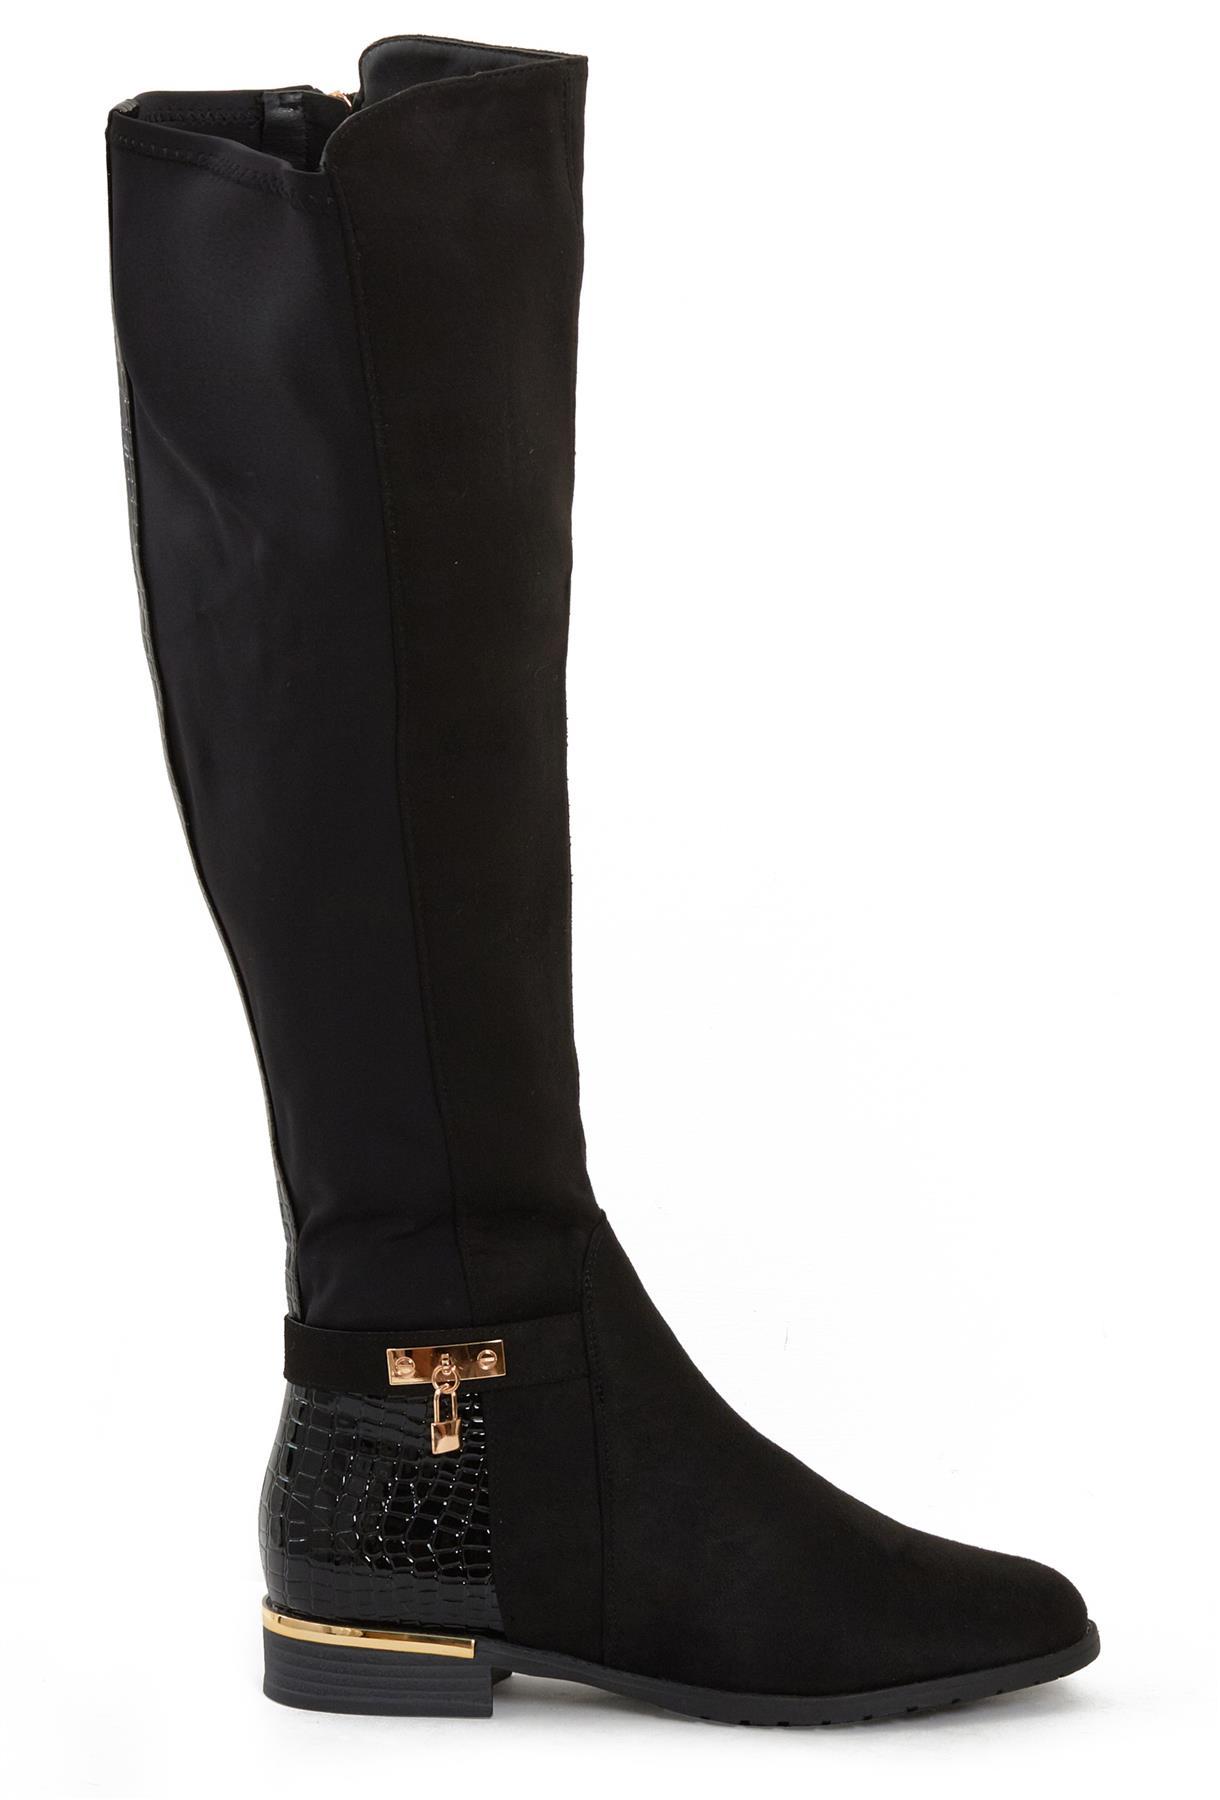 Womens-Ladies-Knee-High-Gold-Detail-Low-Block-Heel-Zip-Up-PU-Suede-Black-Boots thumbnail 8